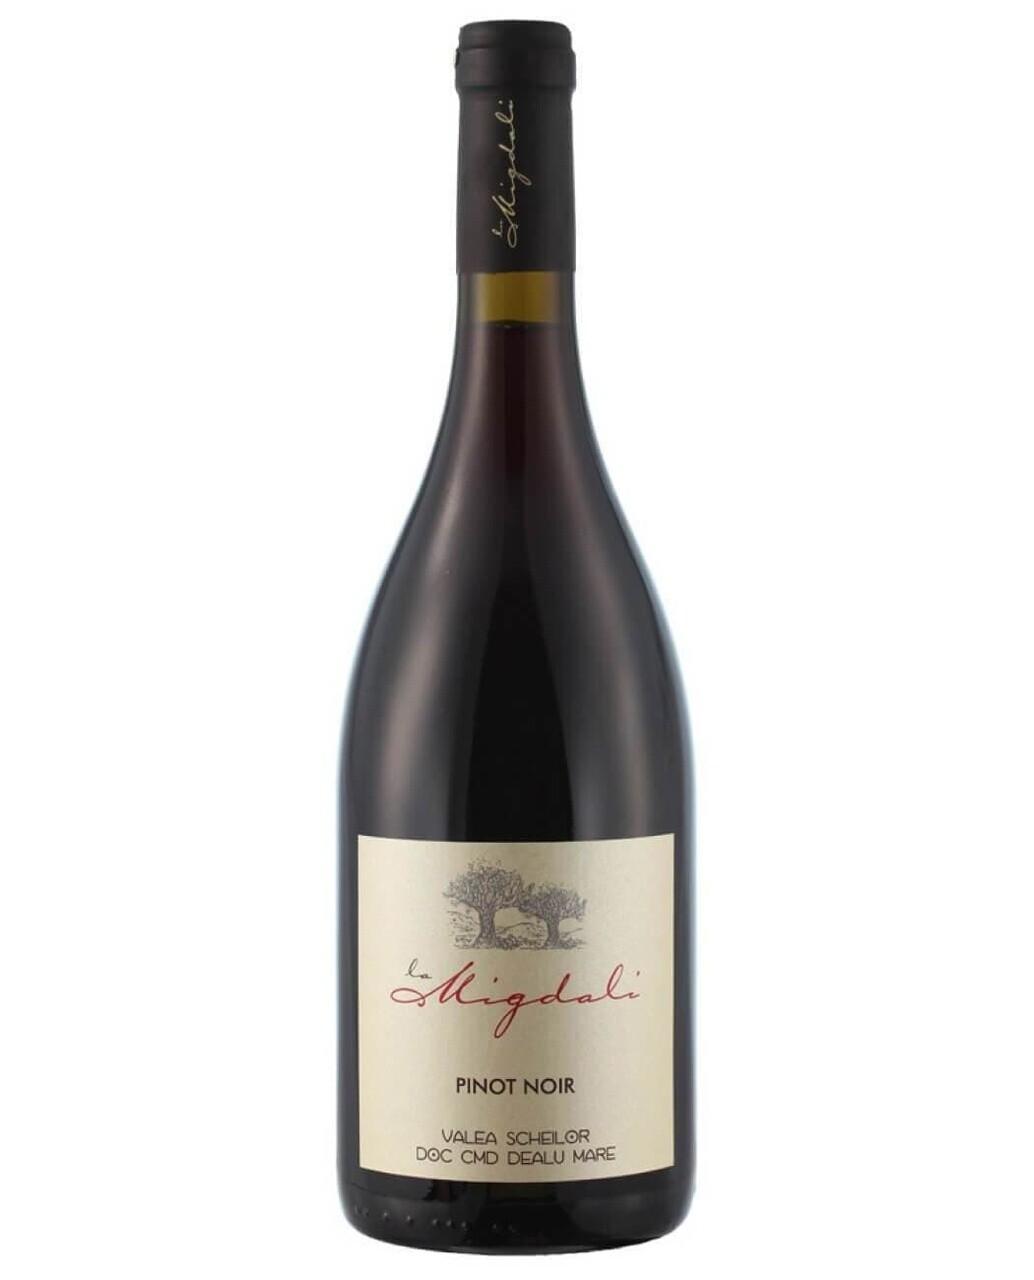 La Migdali Pinot Noir